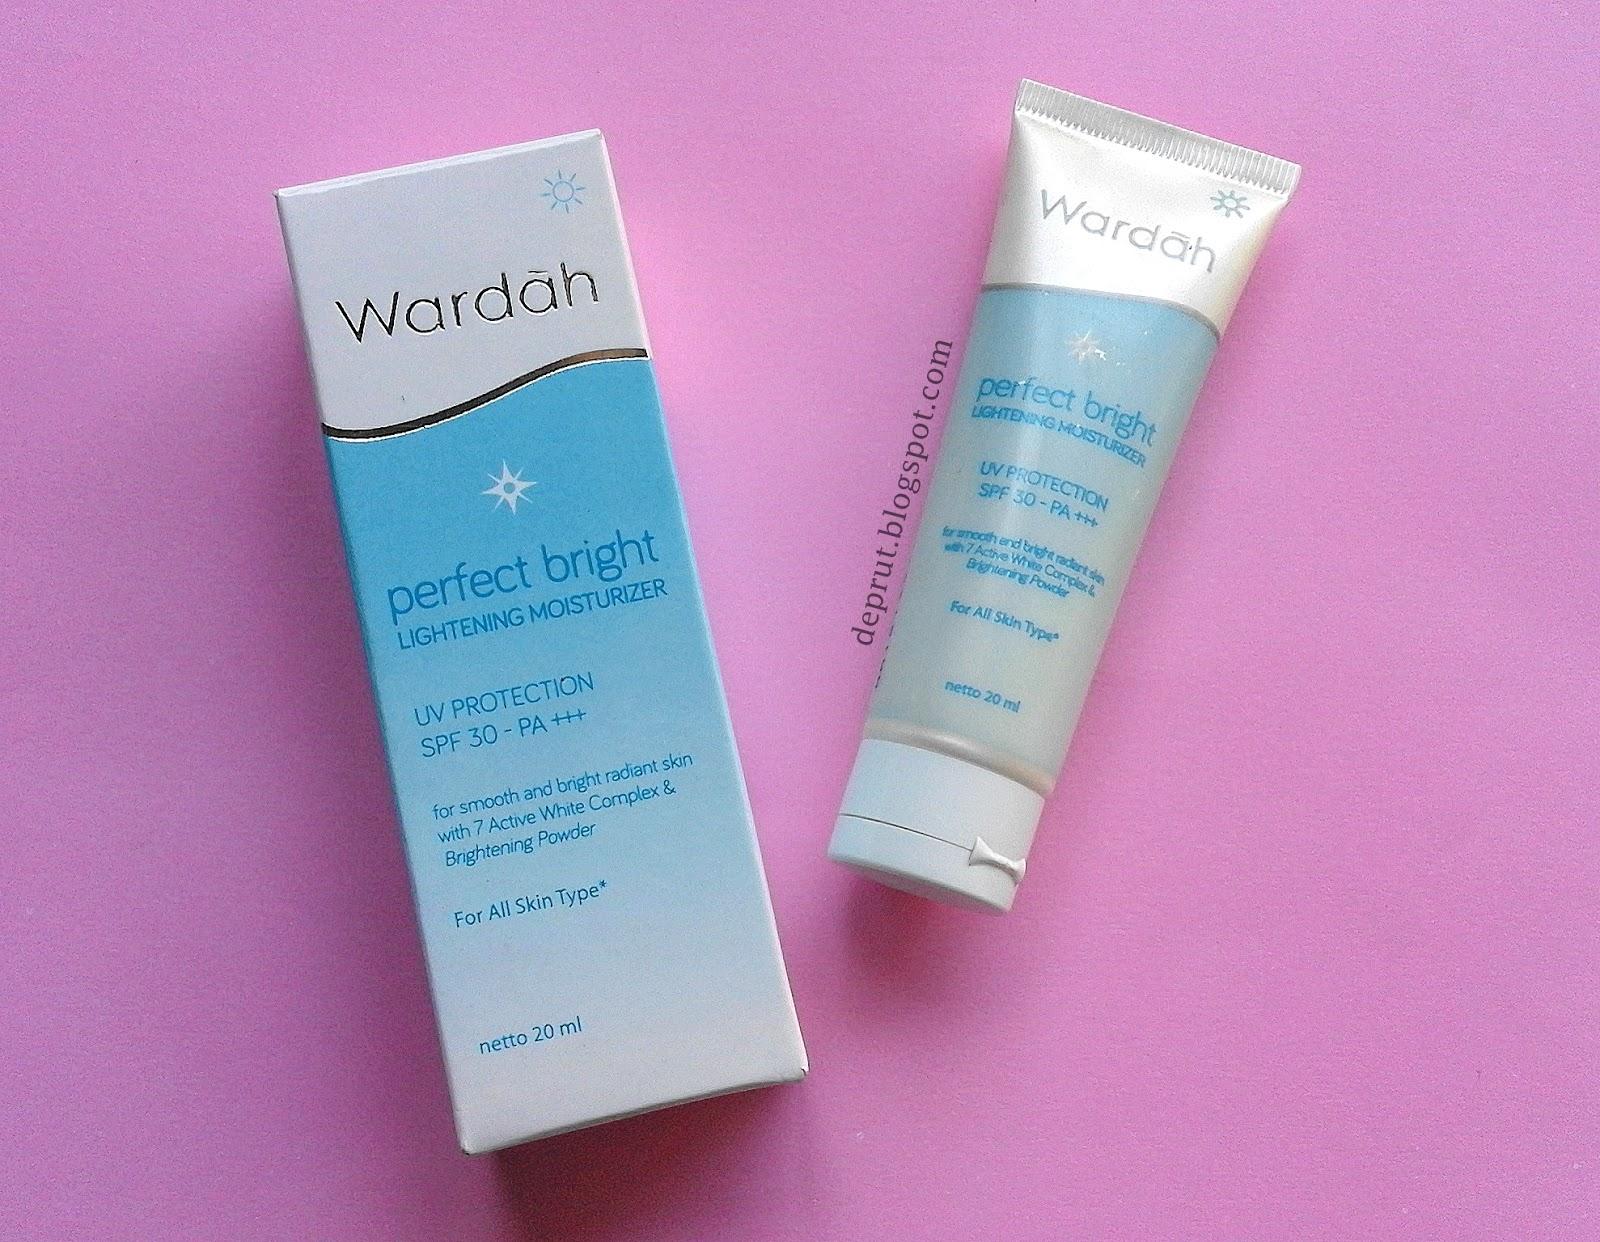 Devi Purwati Review Wardah Perfect Bright Lightening Mosturizer Day Cream 20 Ml